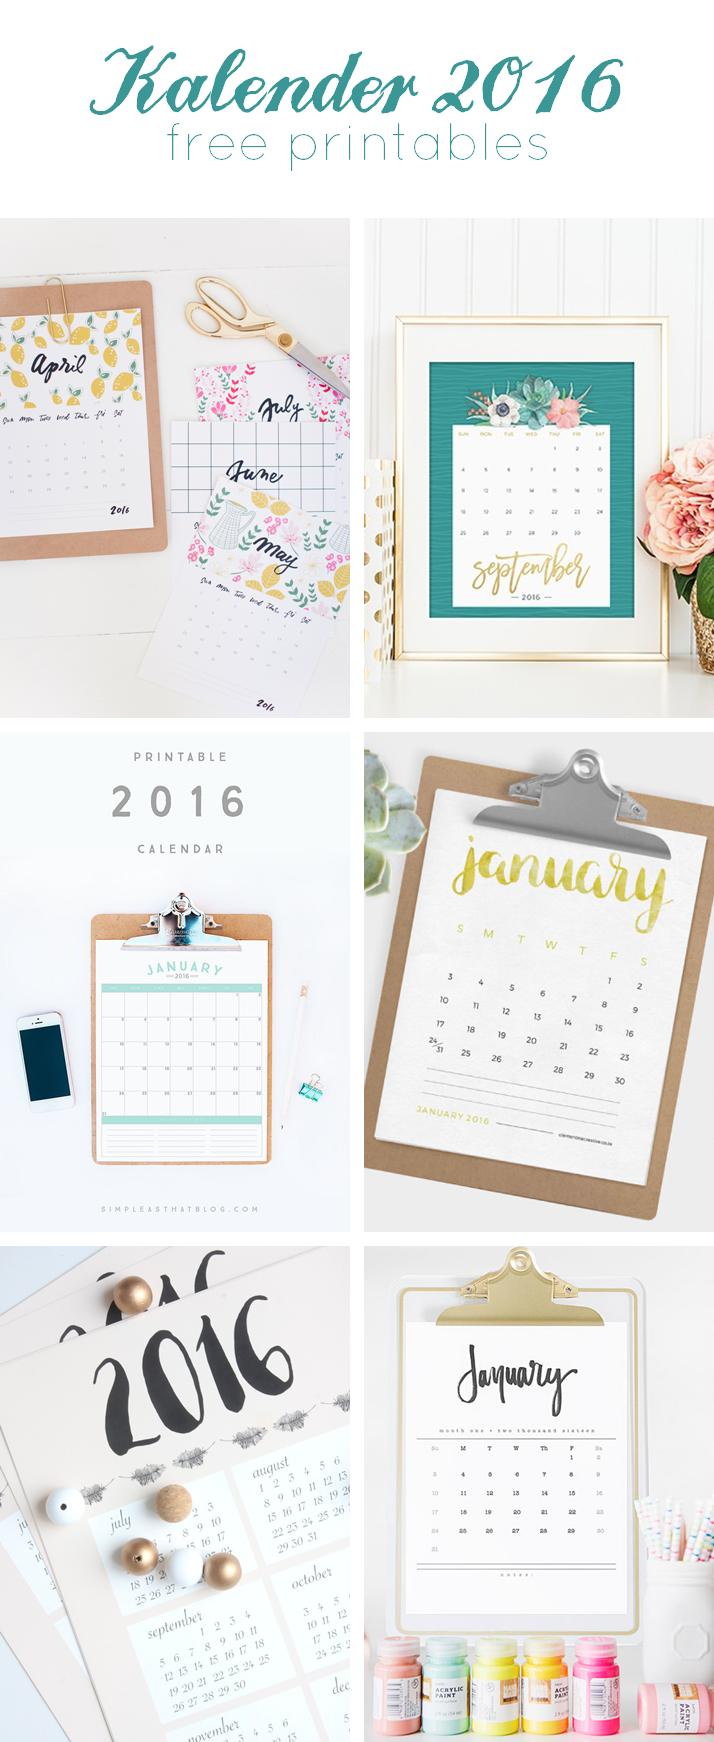 Kalender 2016 - 6 Free Printables